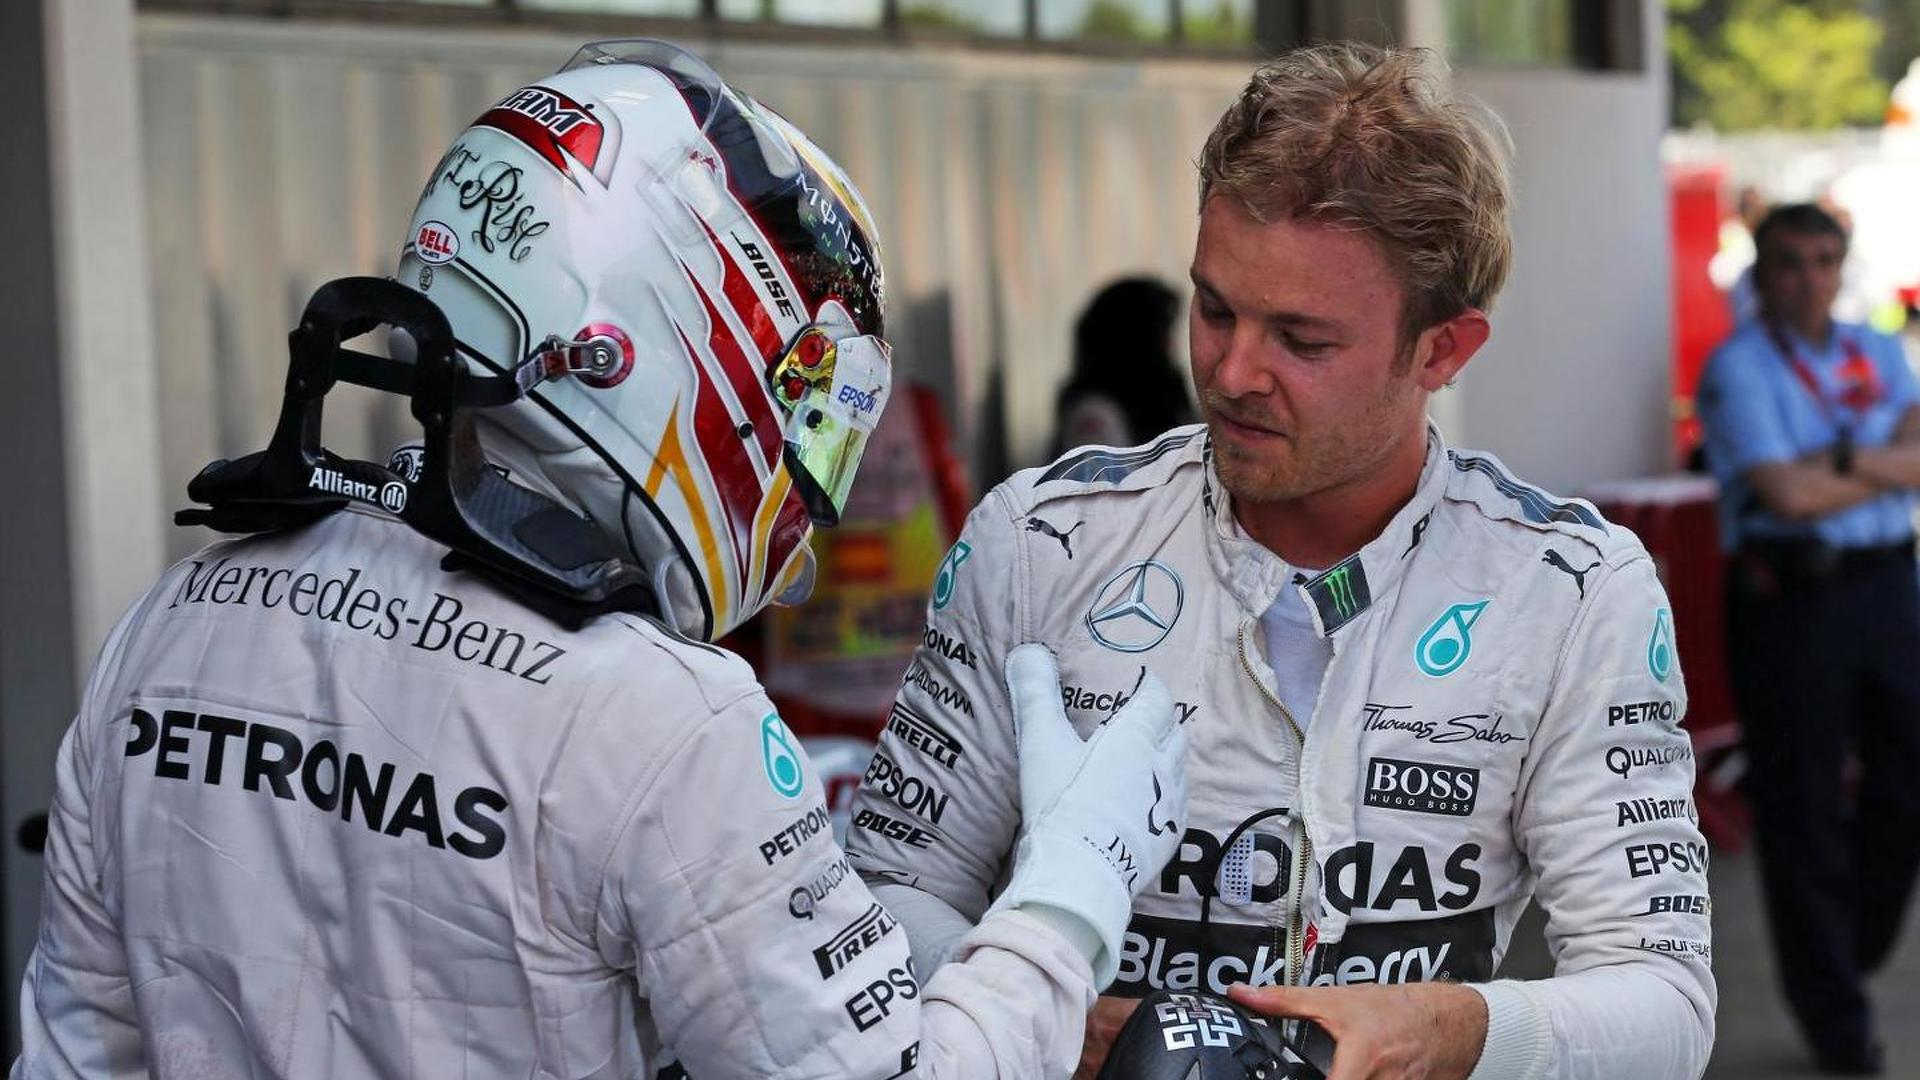 Hill says Hamilton 'underestimated' Rosberg